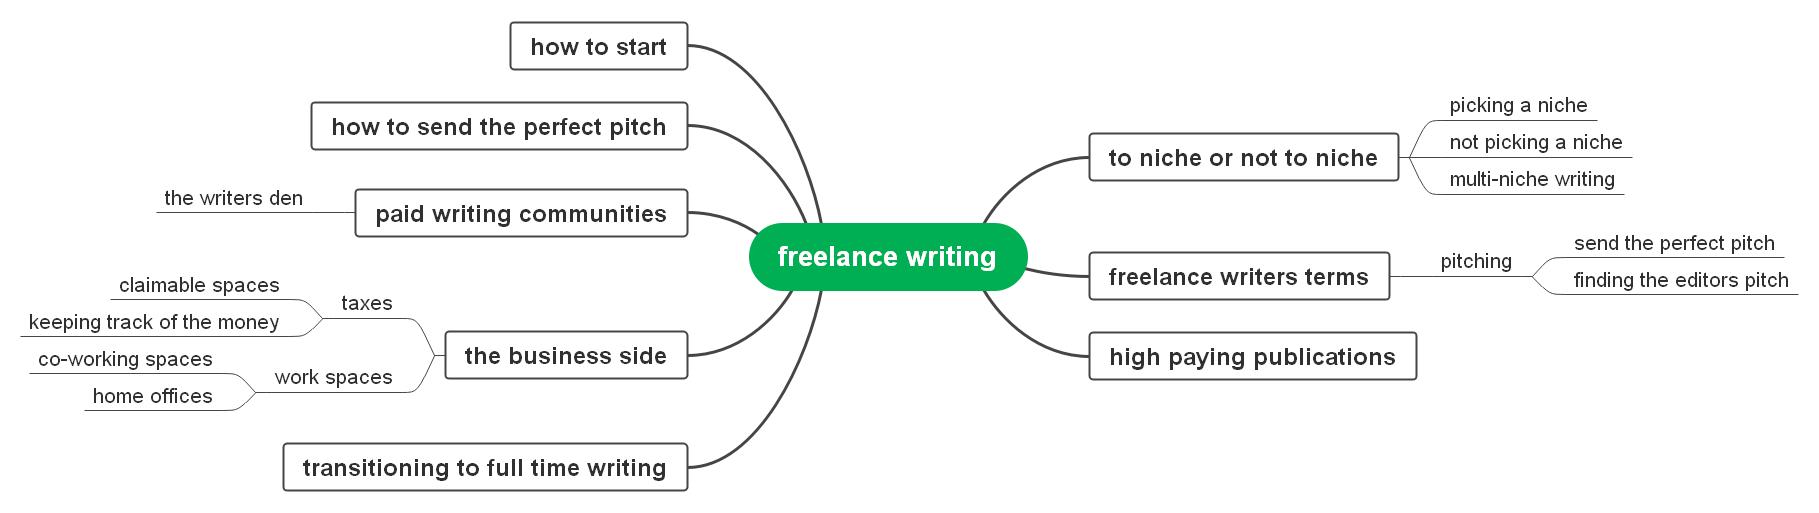 freelancer writing